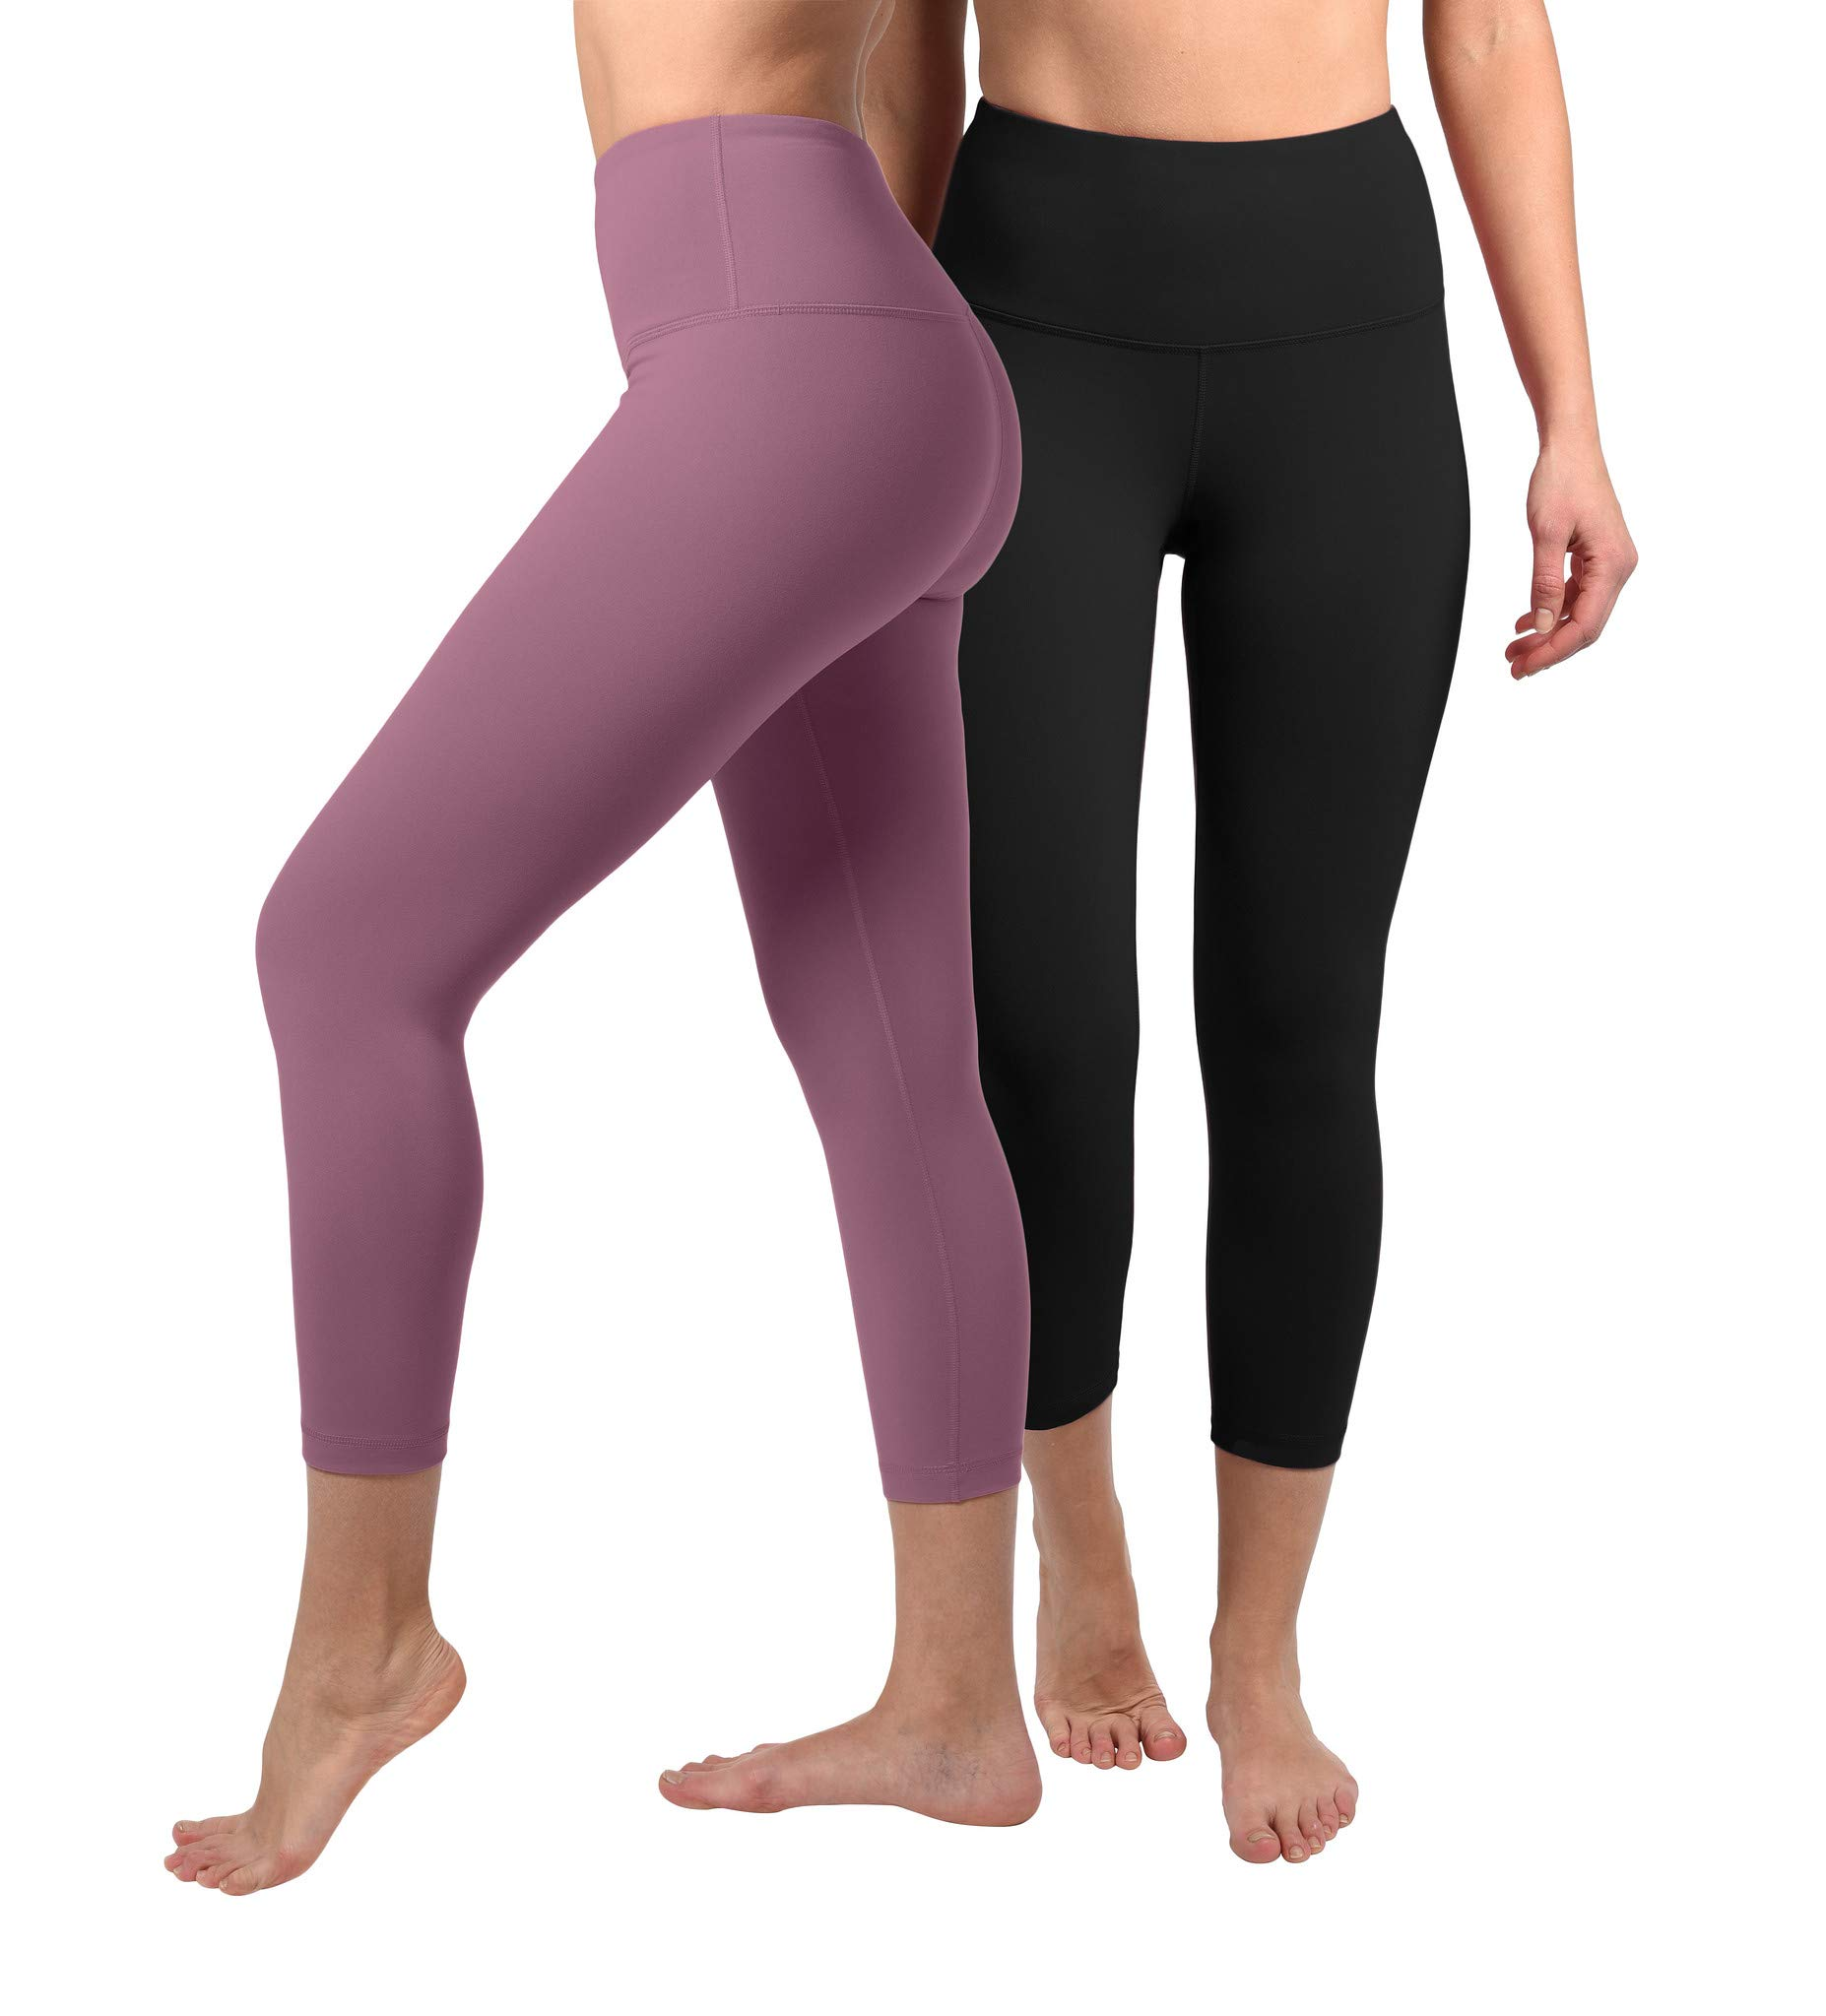 90 Degree By Reflex - High Waist Tummy Control Shapewear - Power Flex Capri - Black and Antique Rose 2 Pack - XS